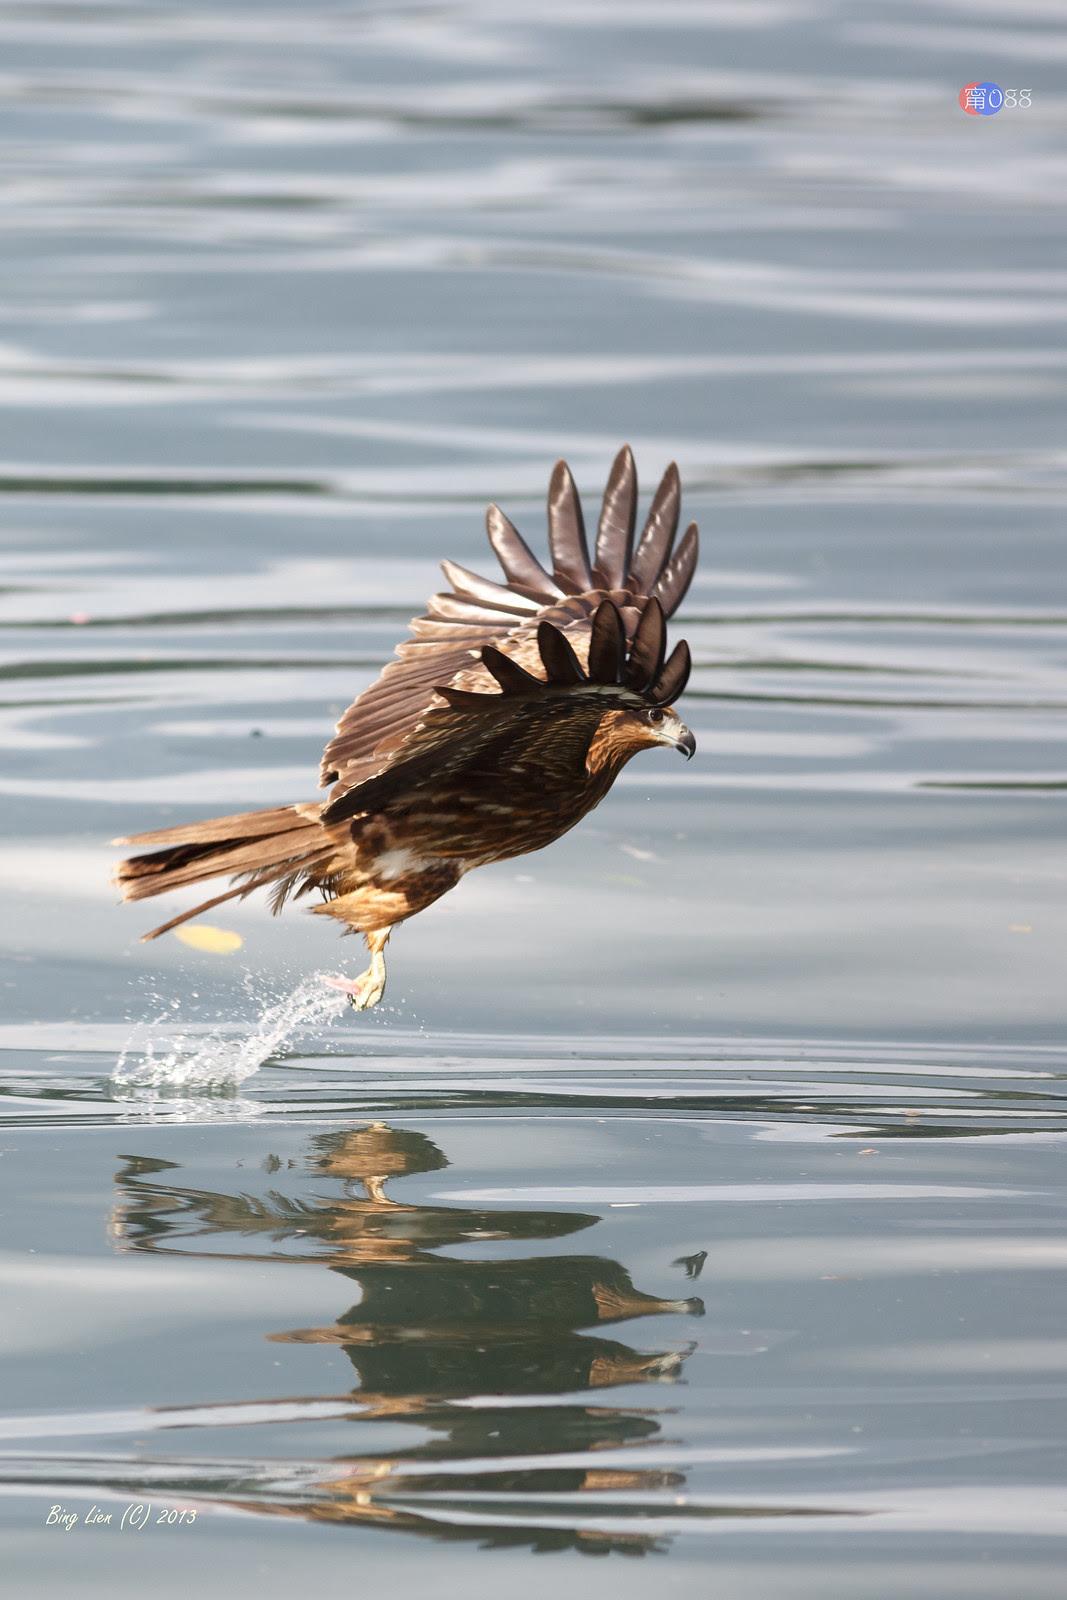 WATER_BING5278_LR